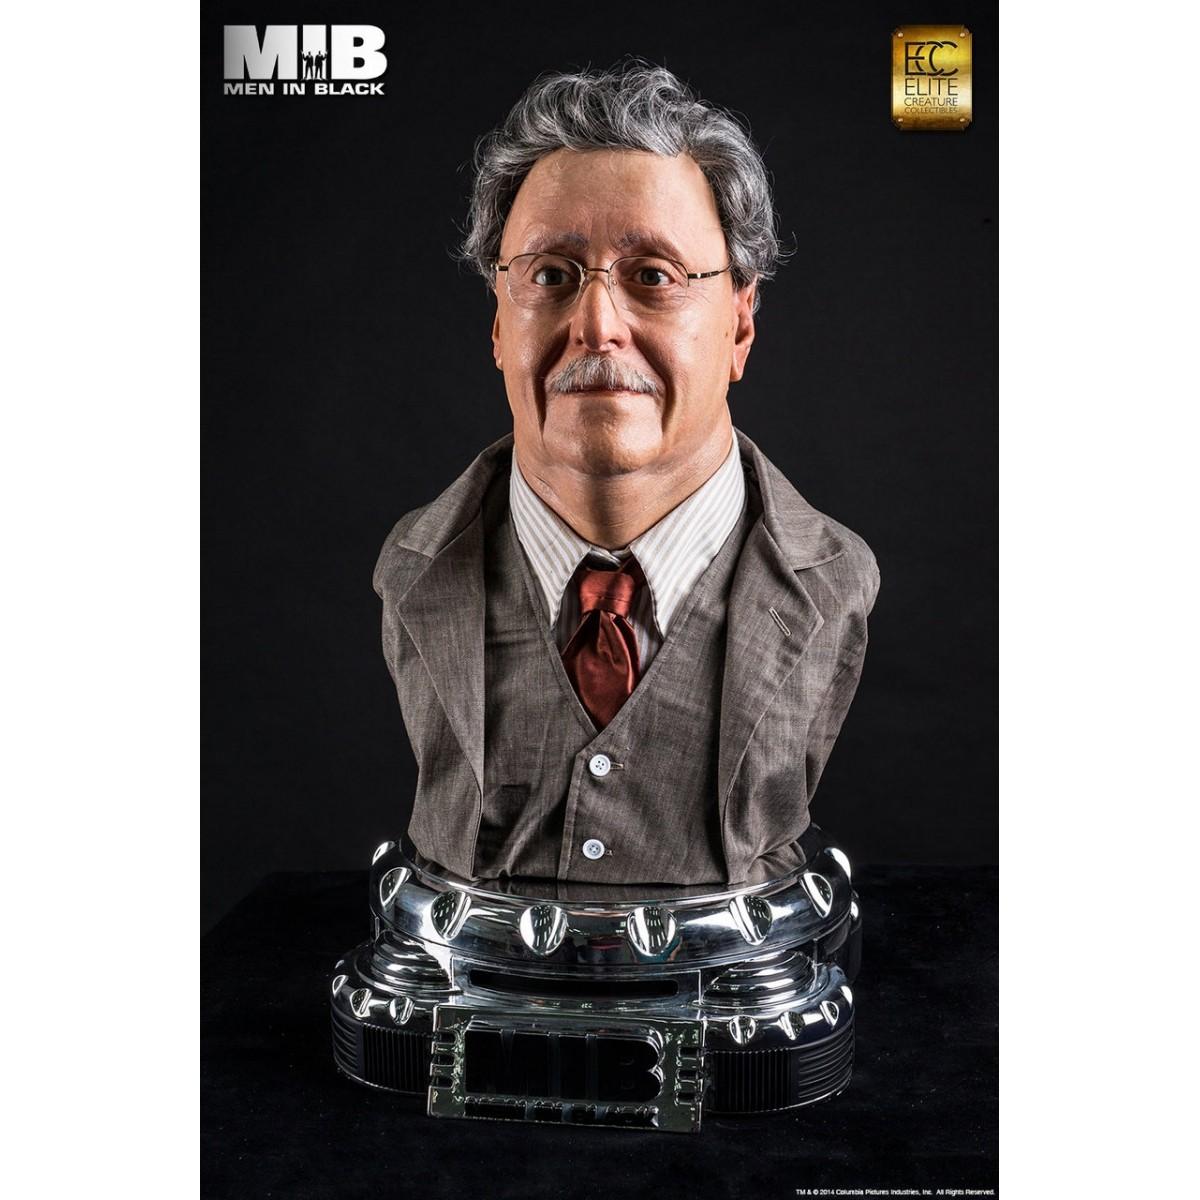 Busto Gentle Rosenburg: MIB: Homens de Preto Escala 1/1 - Elite Creature Collectibles - CG